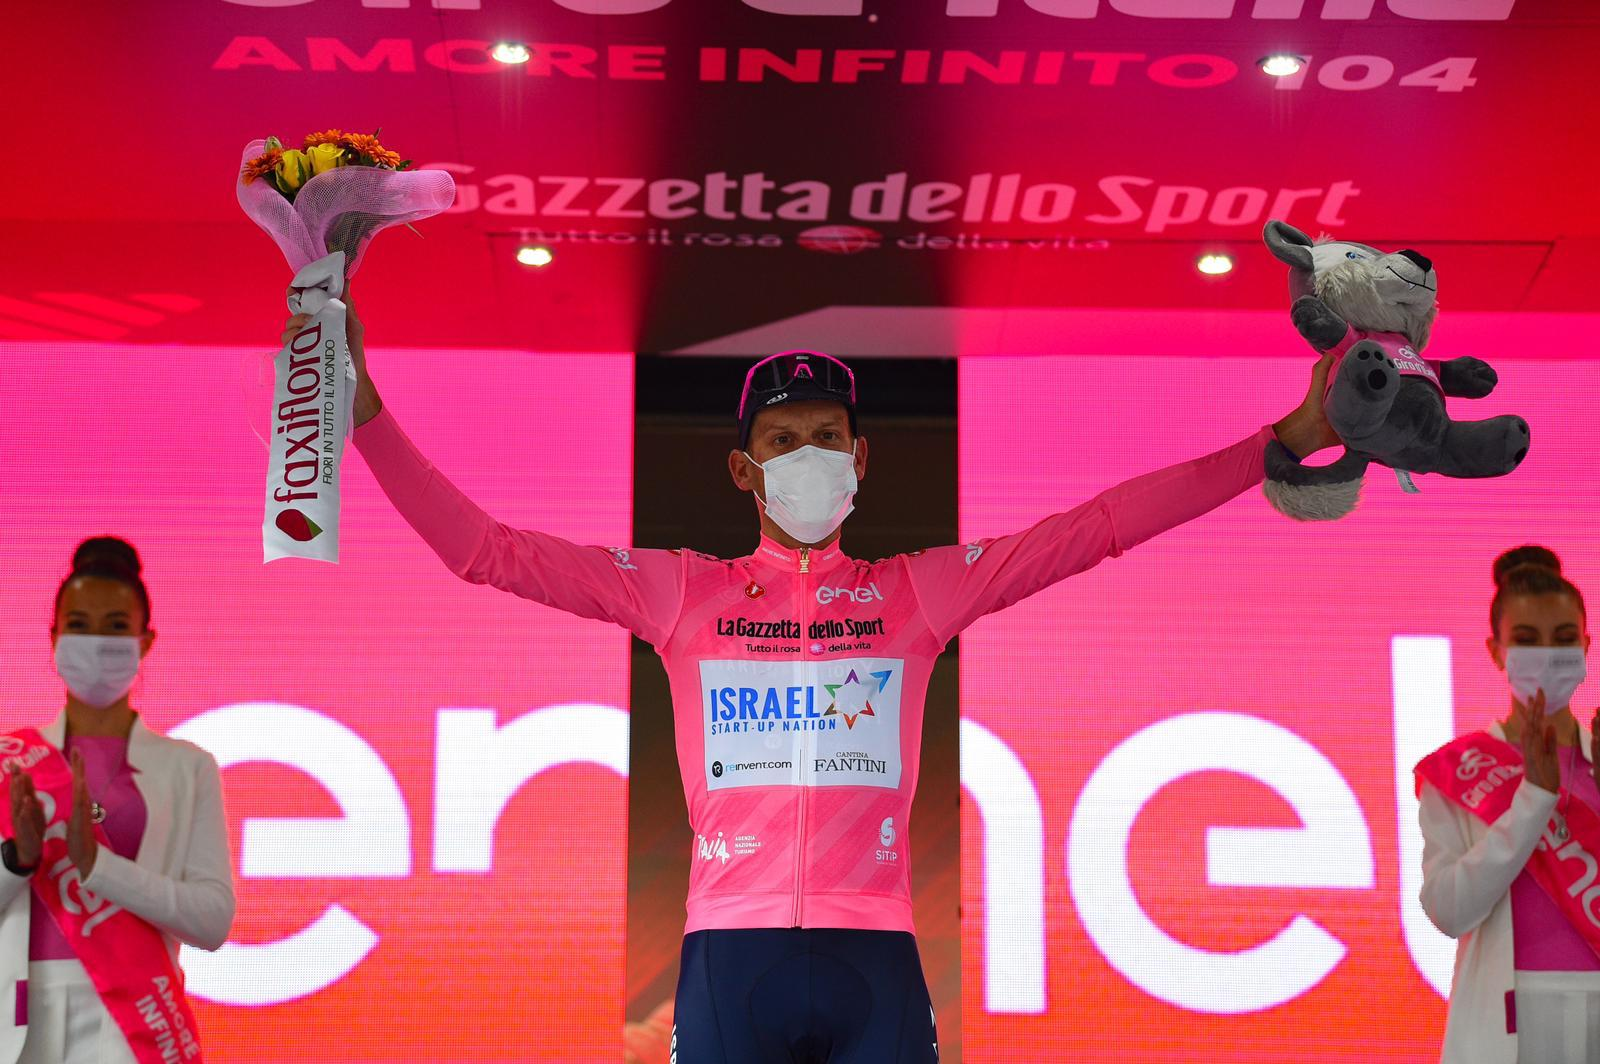 De Marchi takes the pink jersey in Giro d'Italia!